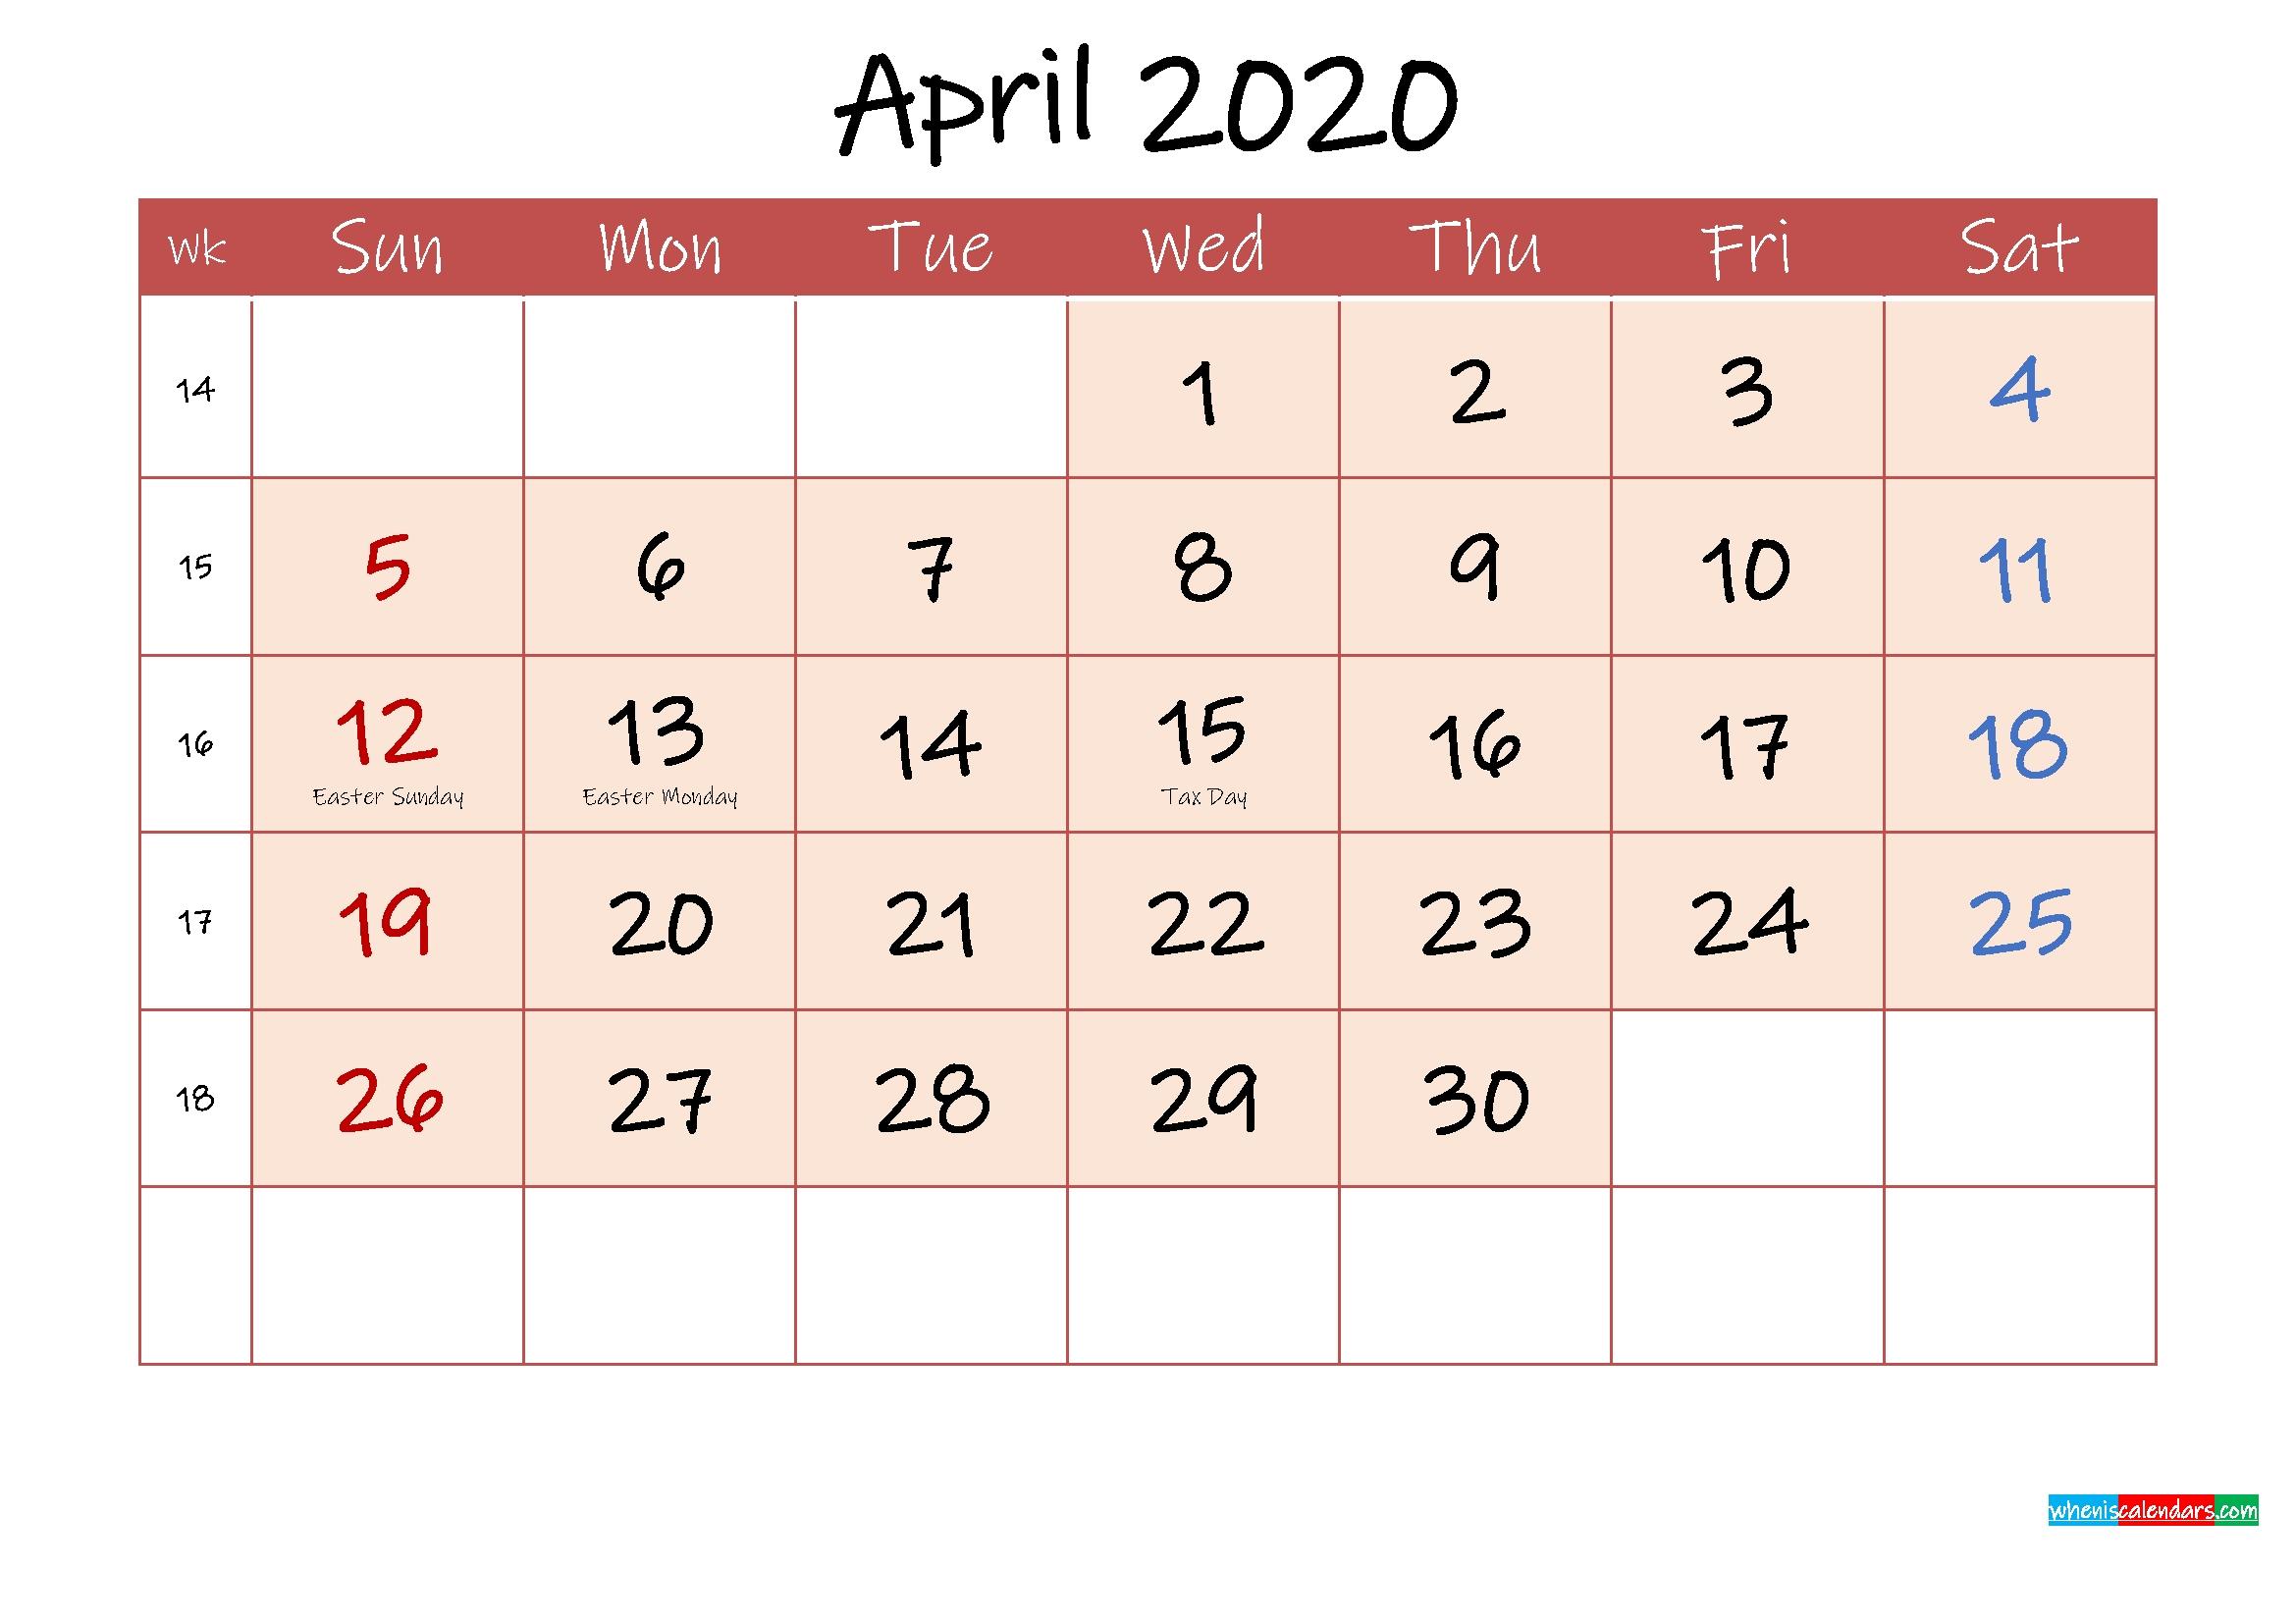 April 2020 Free Printable Calendar With Holidays - Template Ink20M112   Free Printable 2020 Calendar November 2020 To April 2021